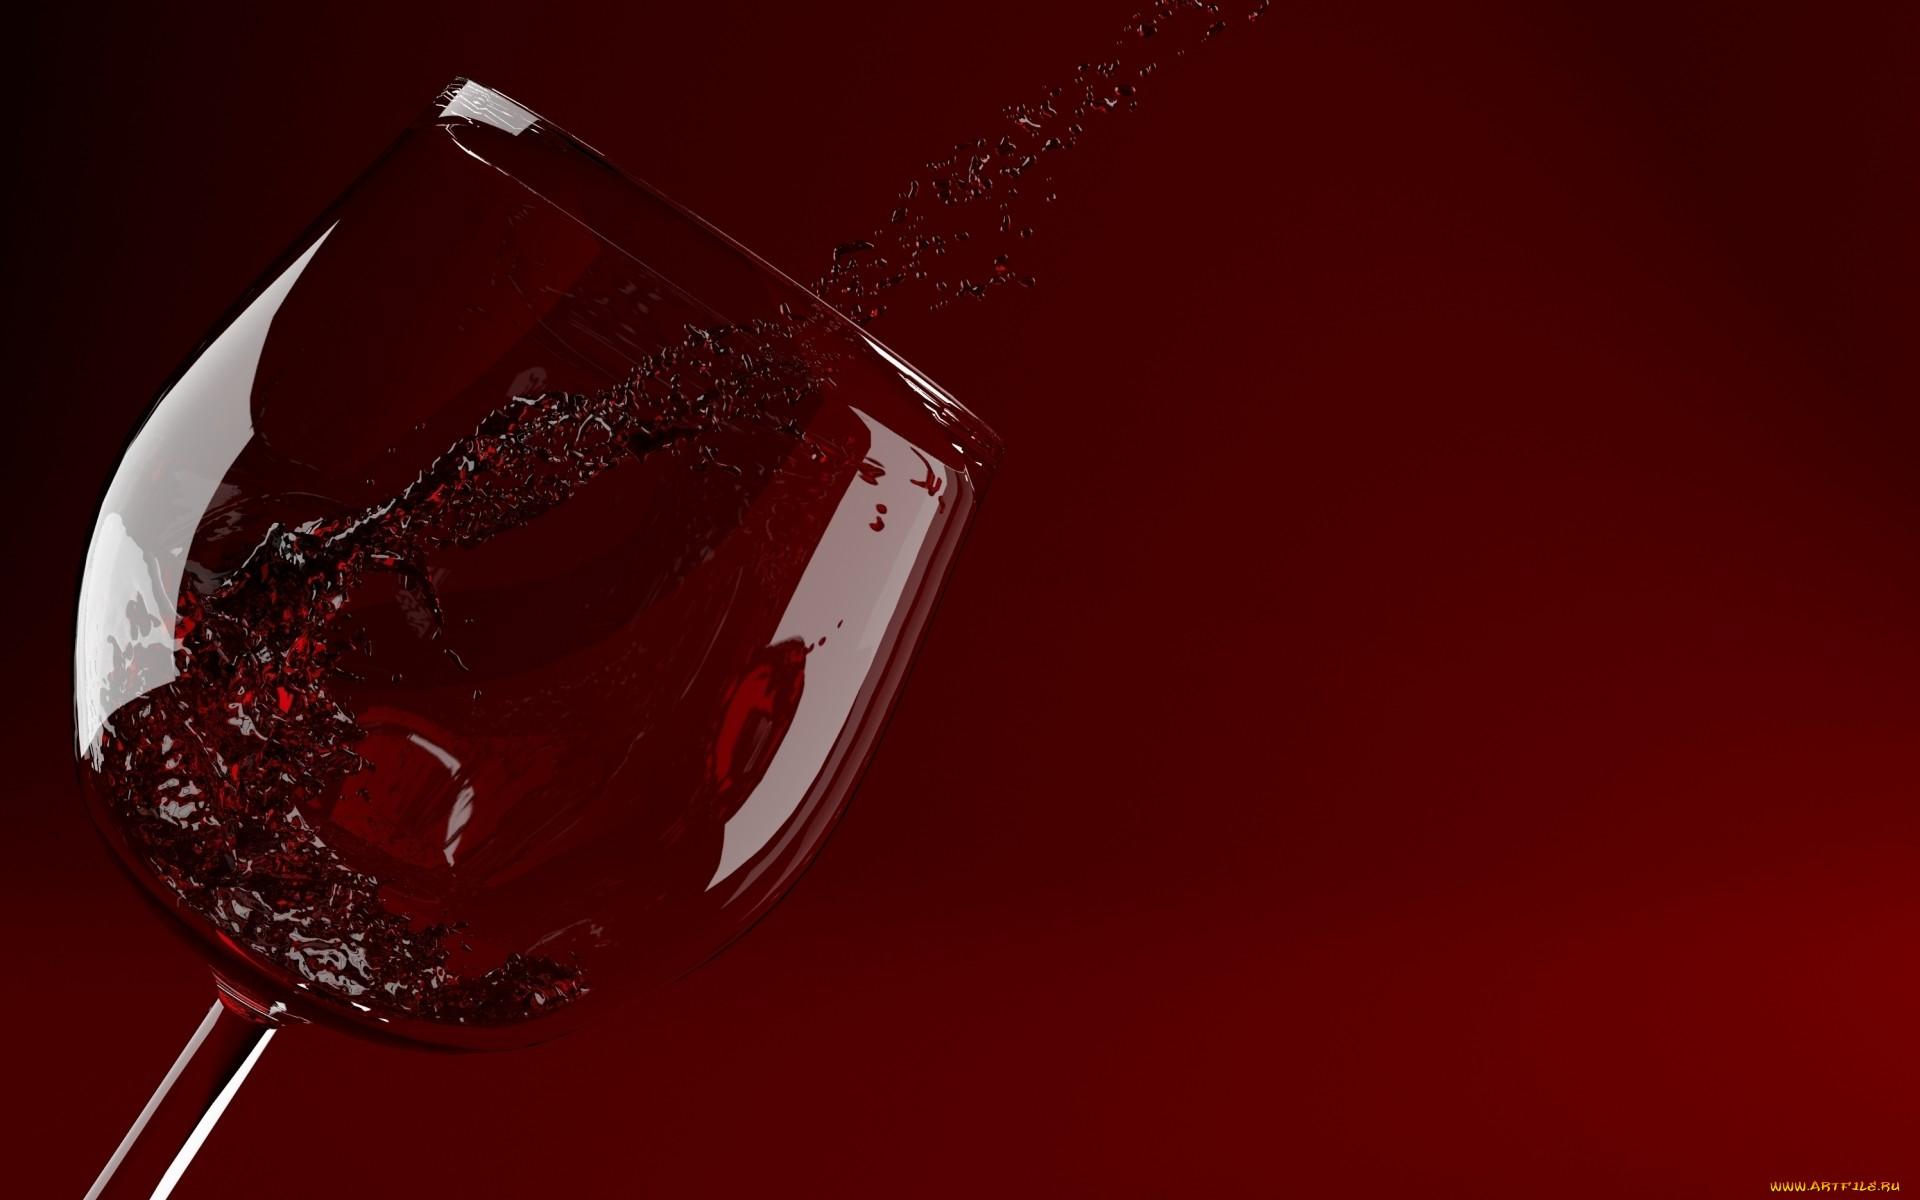 Вино - Wine (55 обоев) » Смотри Красивые ...: lookw.ru/eda/page,2,102-vino-wine-55-oboev.html